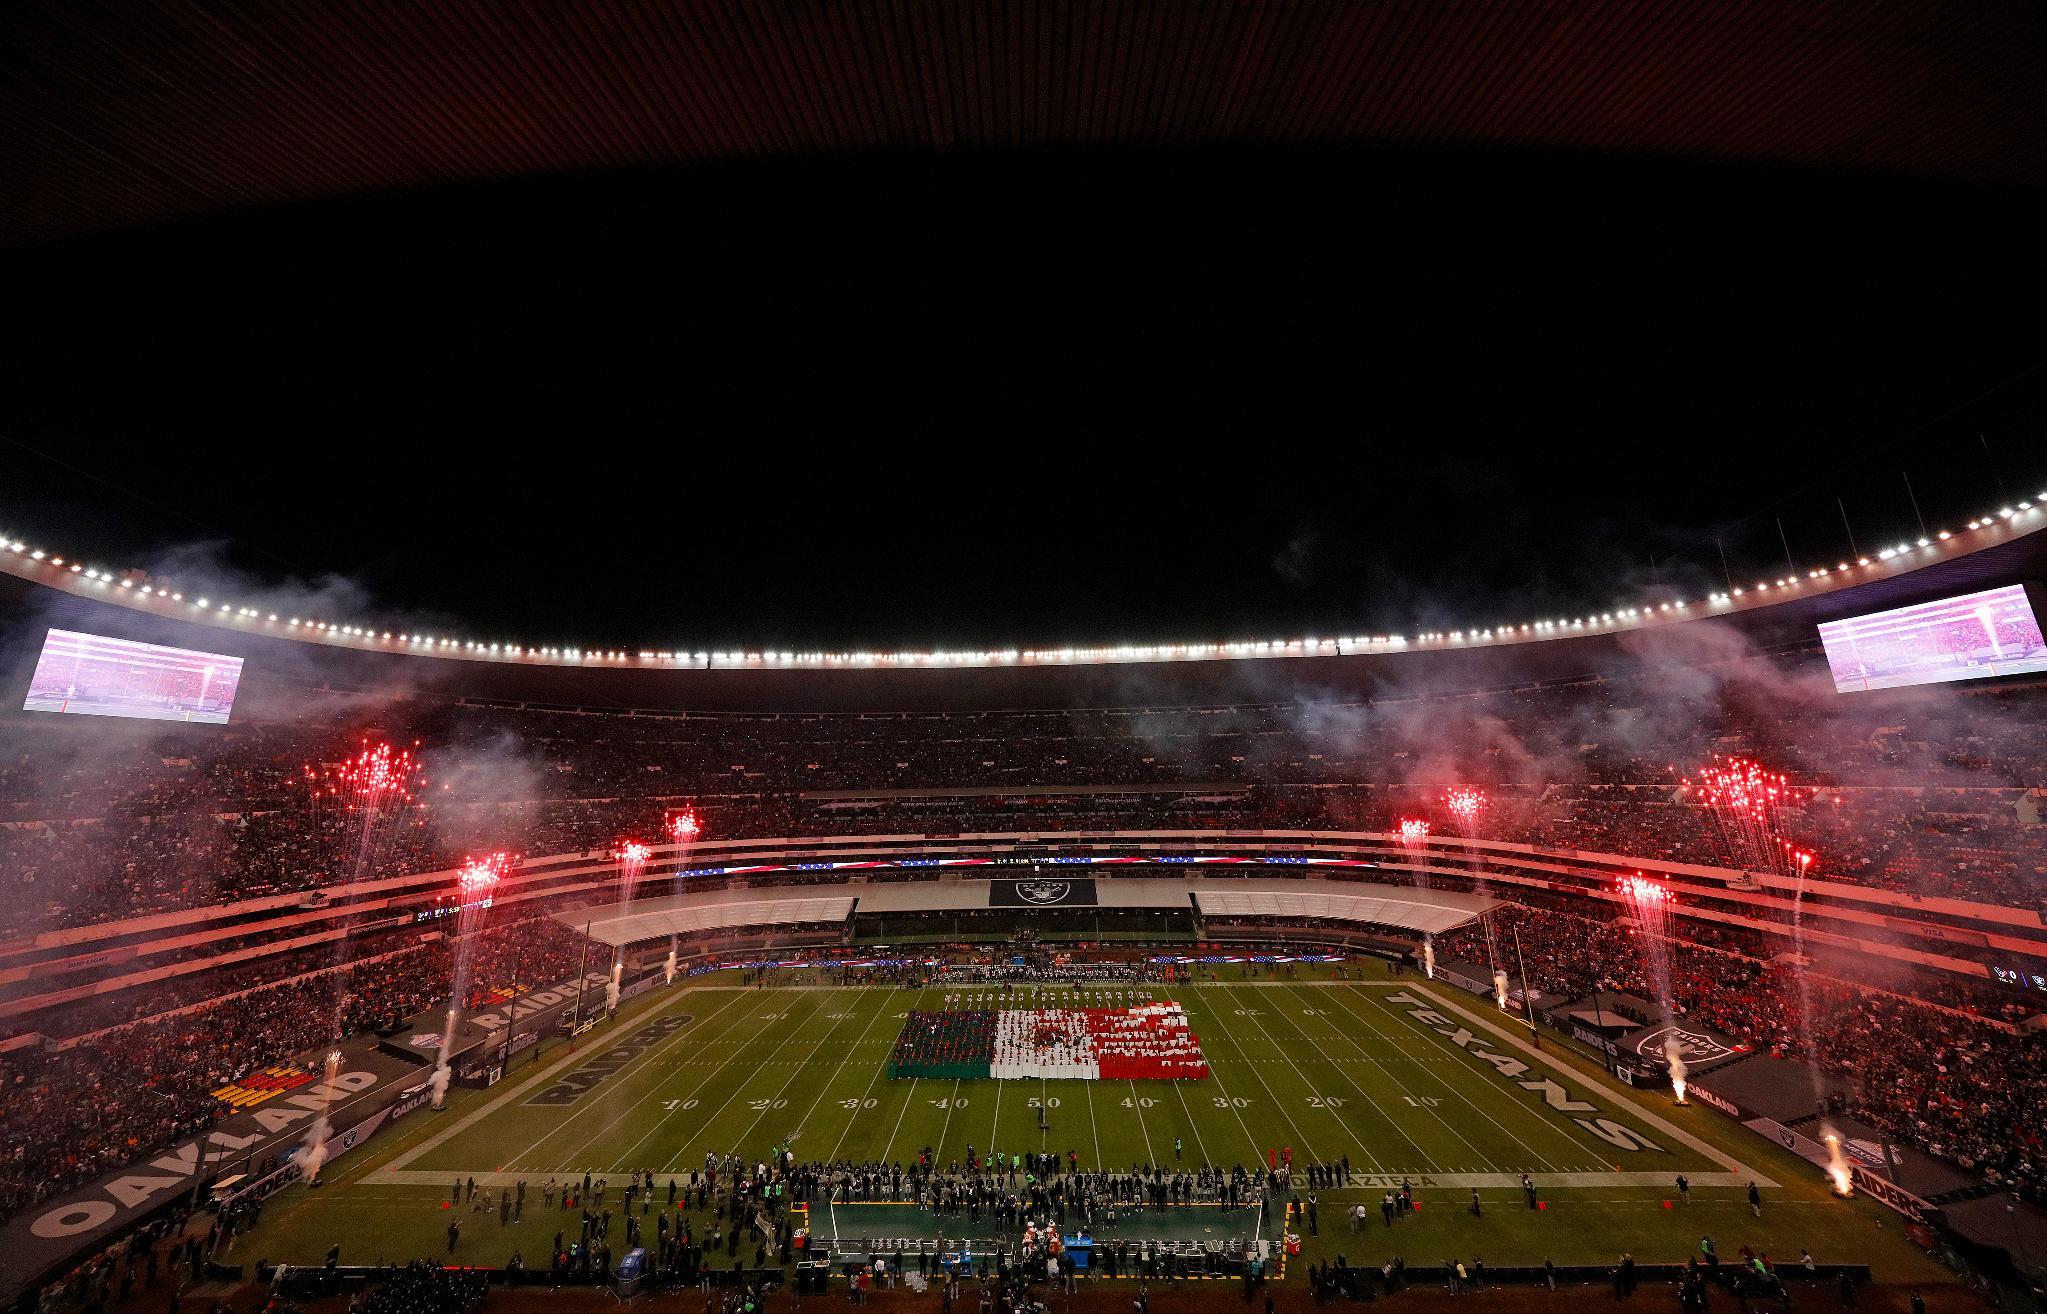 [NFL] Week 11: ¡Que viva Mexico! (Houston Texans vs Oakland Raiders 20-27)